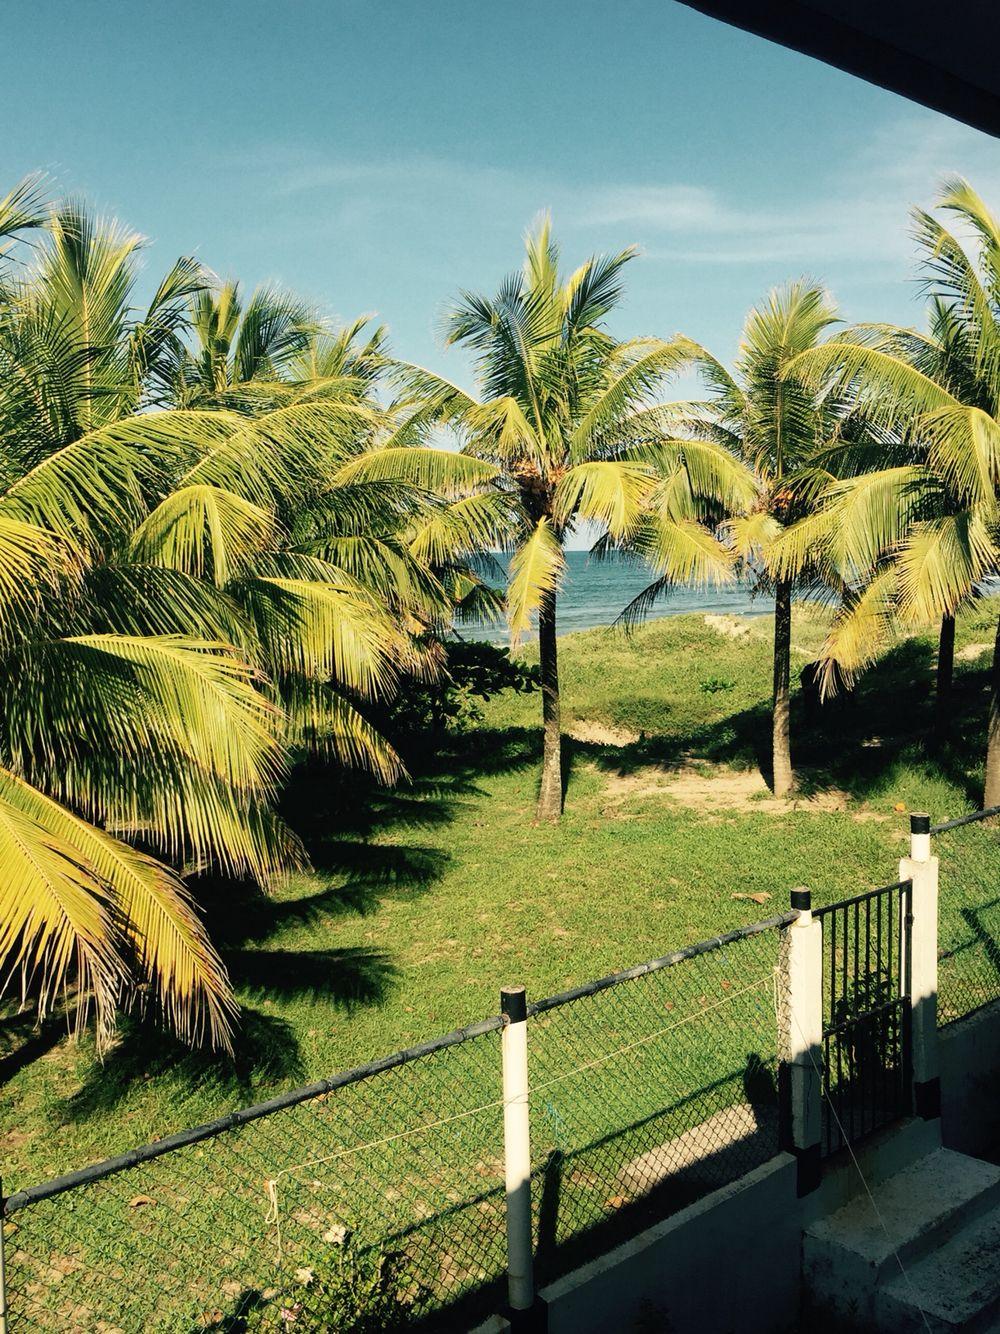 Limon Honduras Places Outdoor Travel